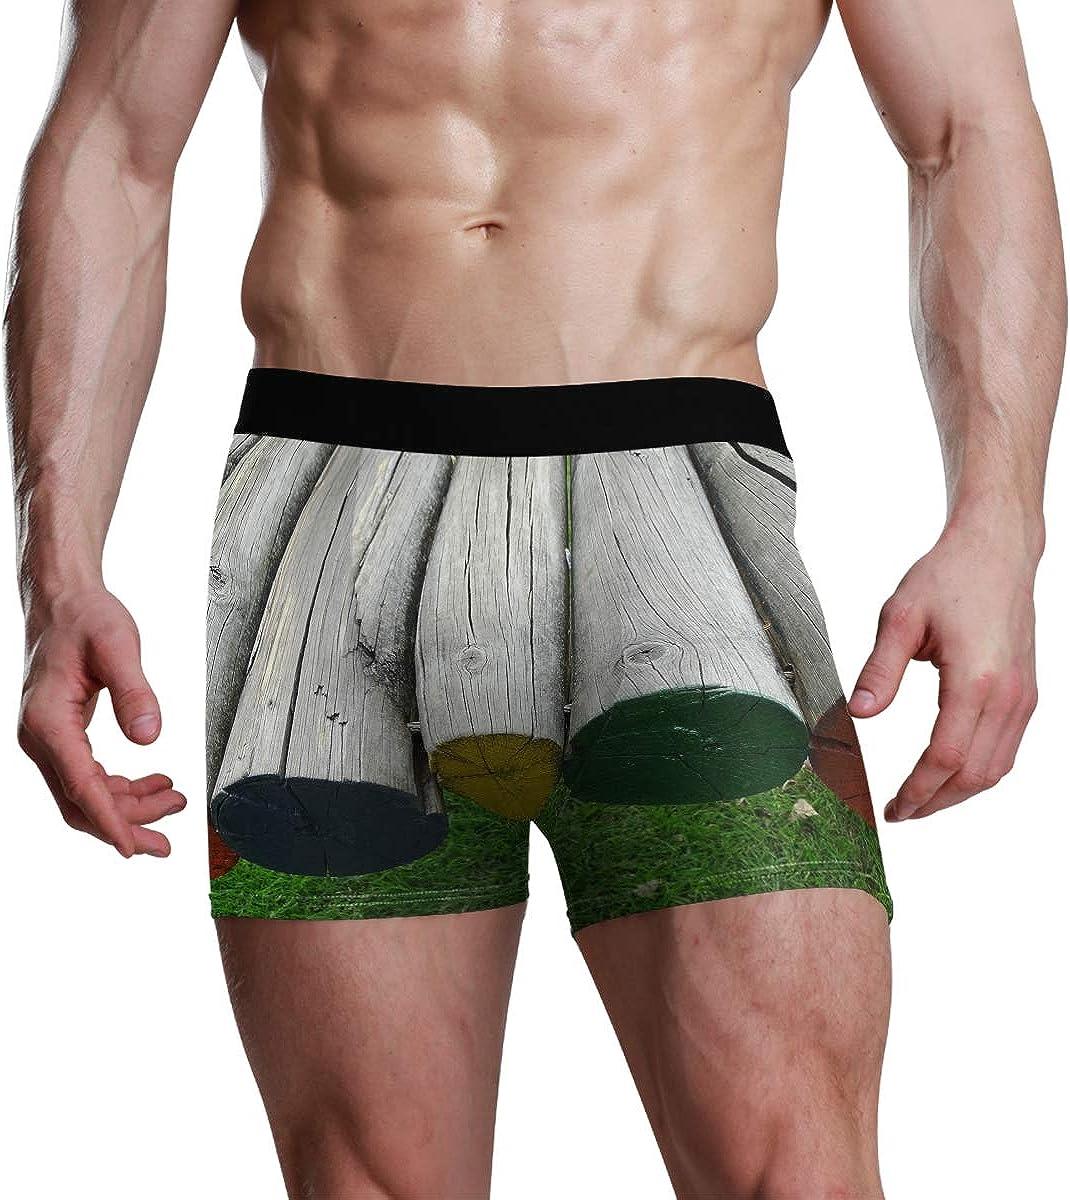 HangWang Men's Boxer Briefs Colored Wood Bikini Underwear Stretch Trunks Boys Underpants